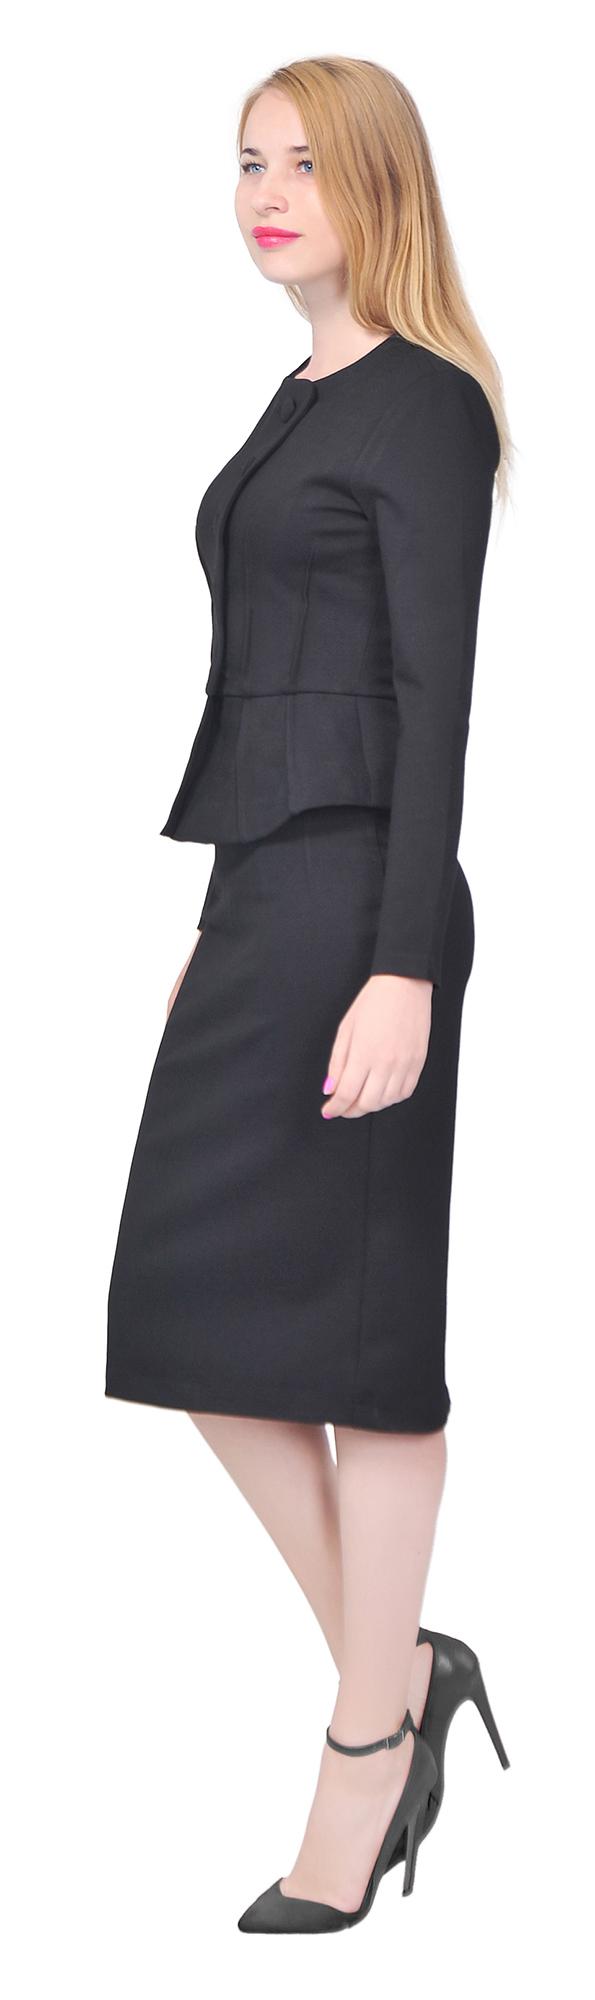 4d6a45a29204 MARYCRAFTS WOMEN S FORMAL OFFICE BUSINESS WORK SUIT SHIRT JACKET ...